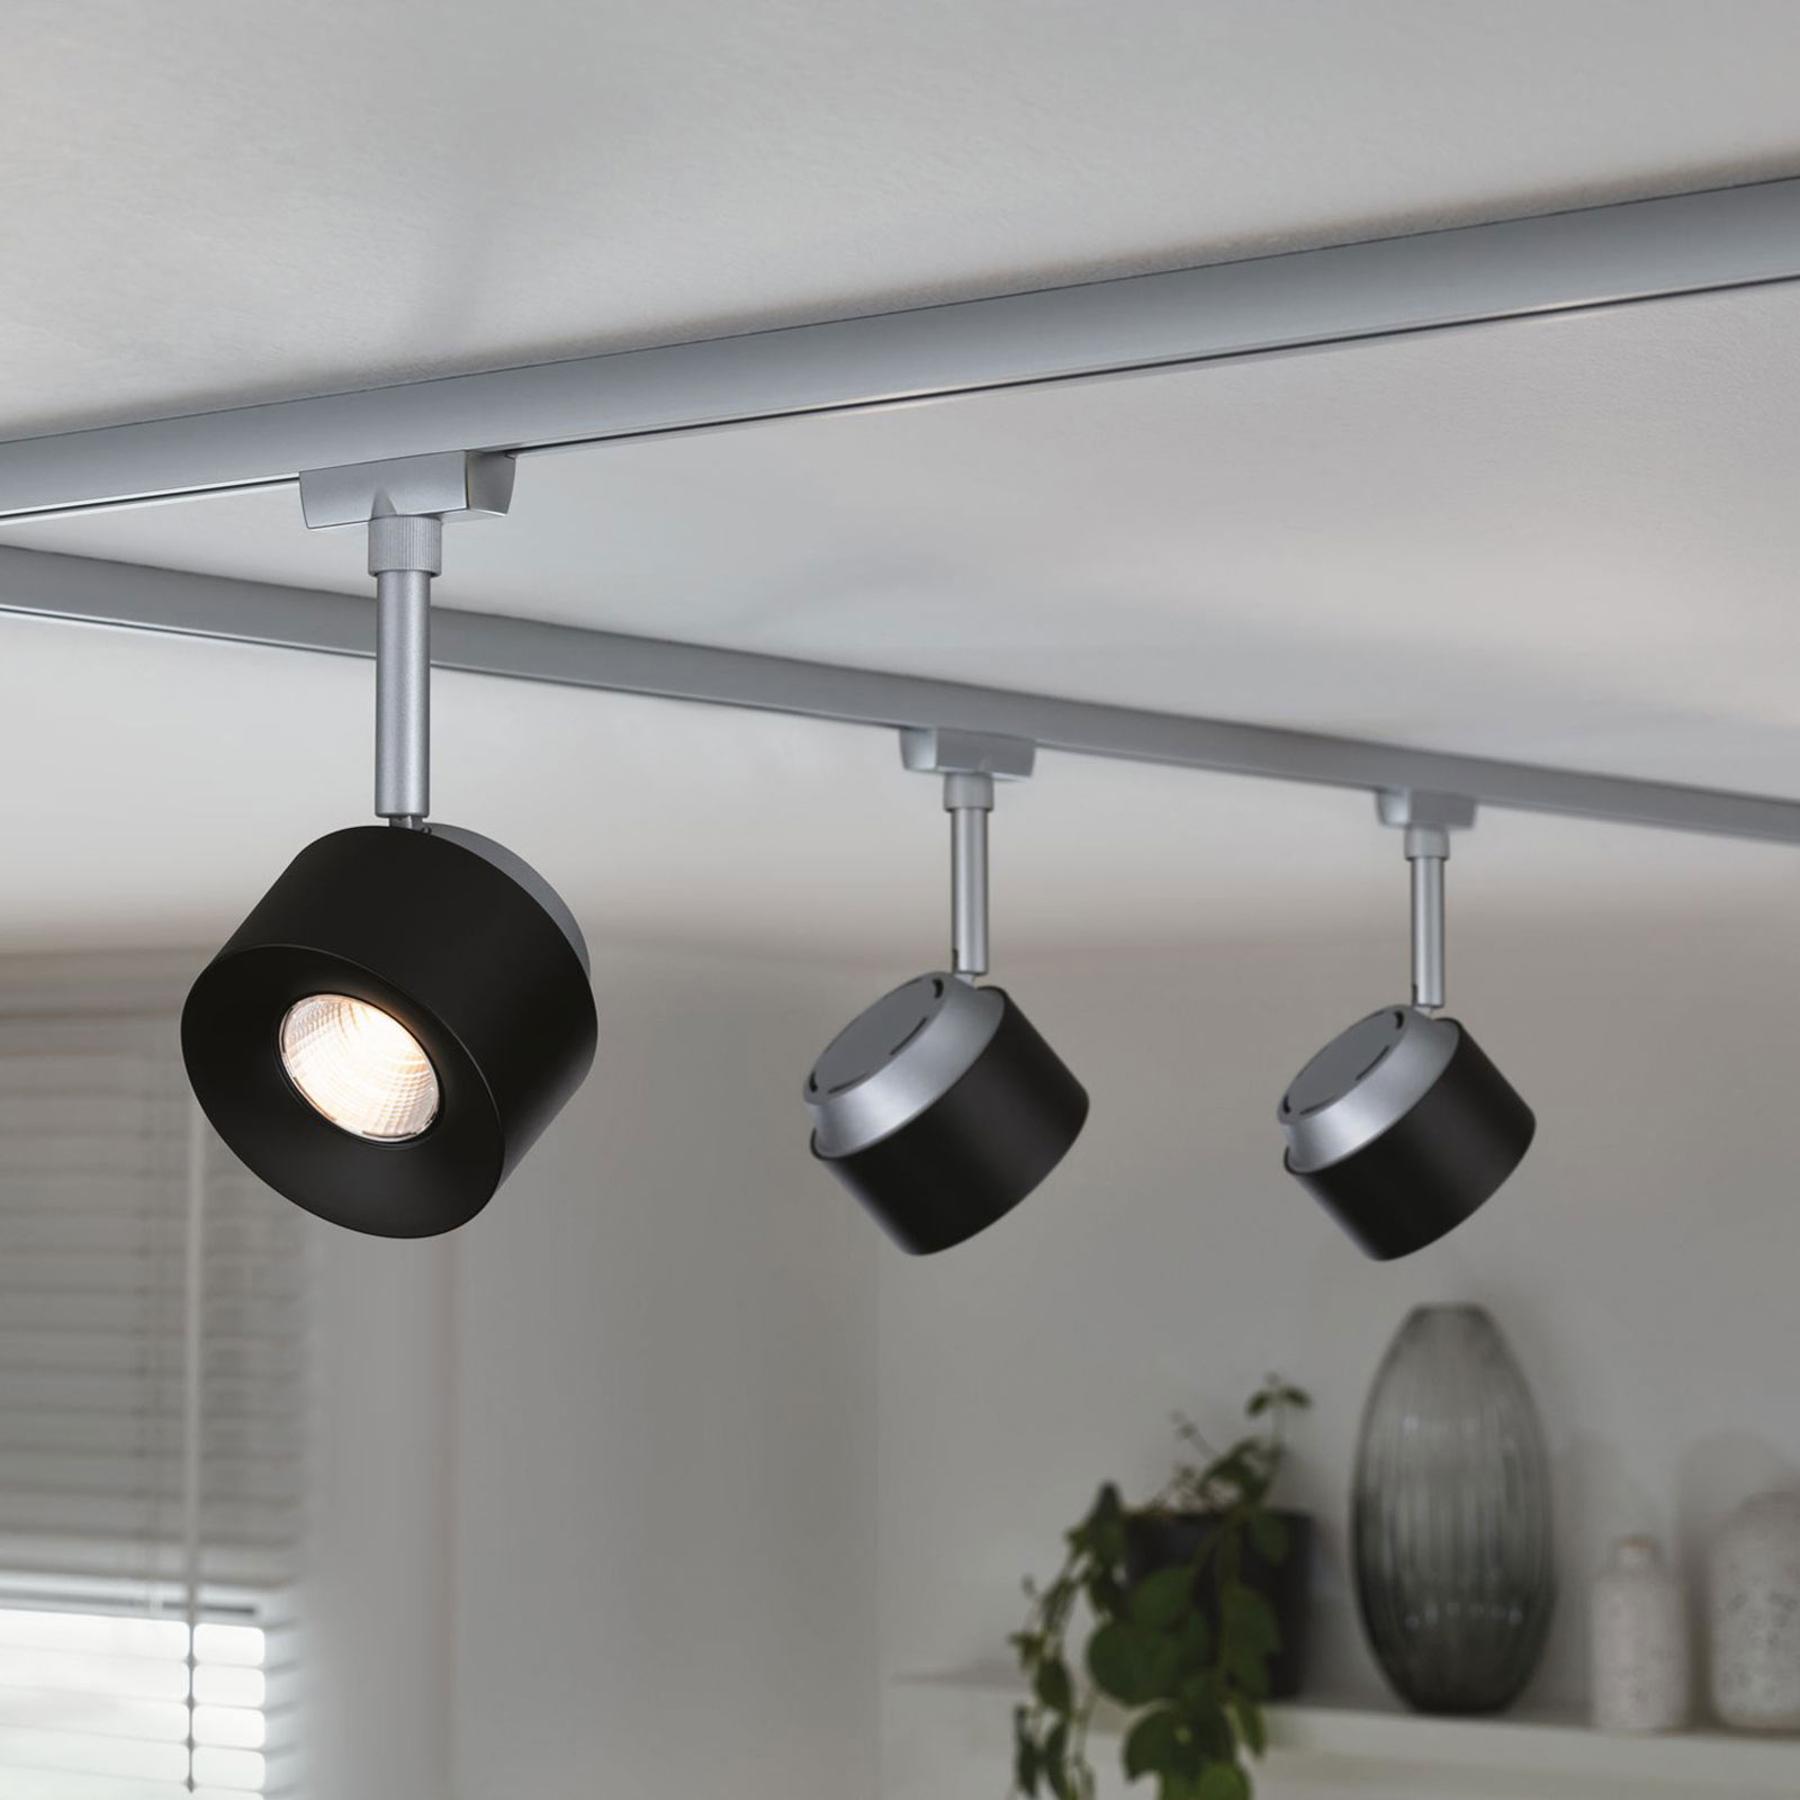 Paulmann URail spot LED Pane cromo satinato, nero Offerte e sconti